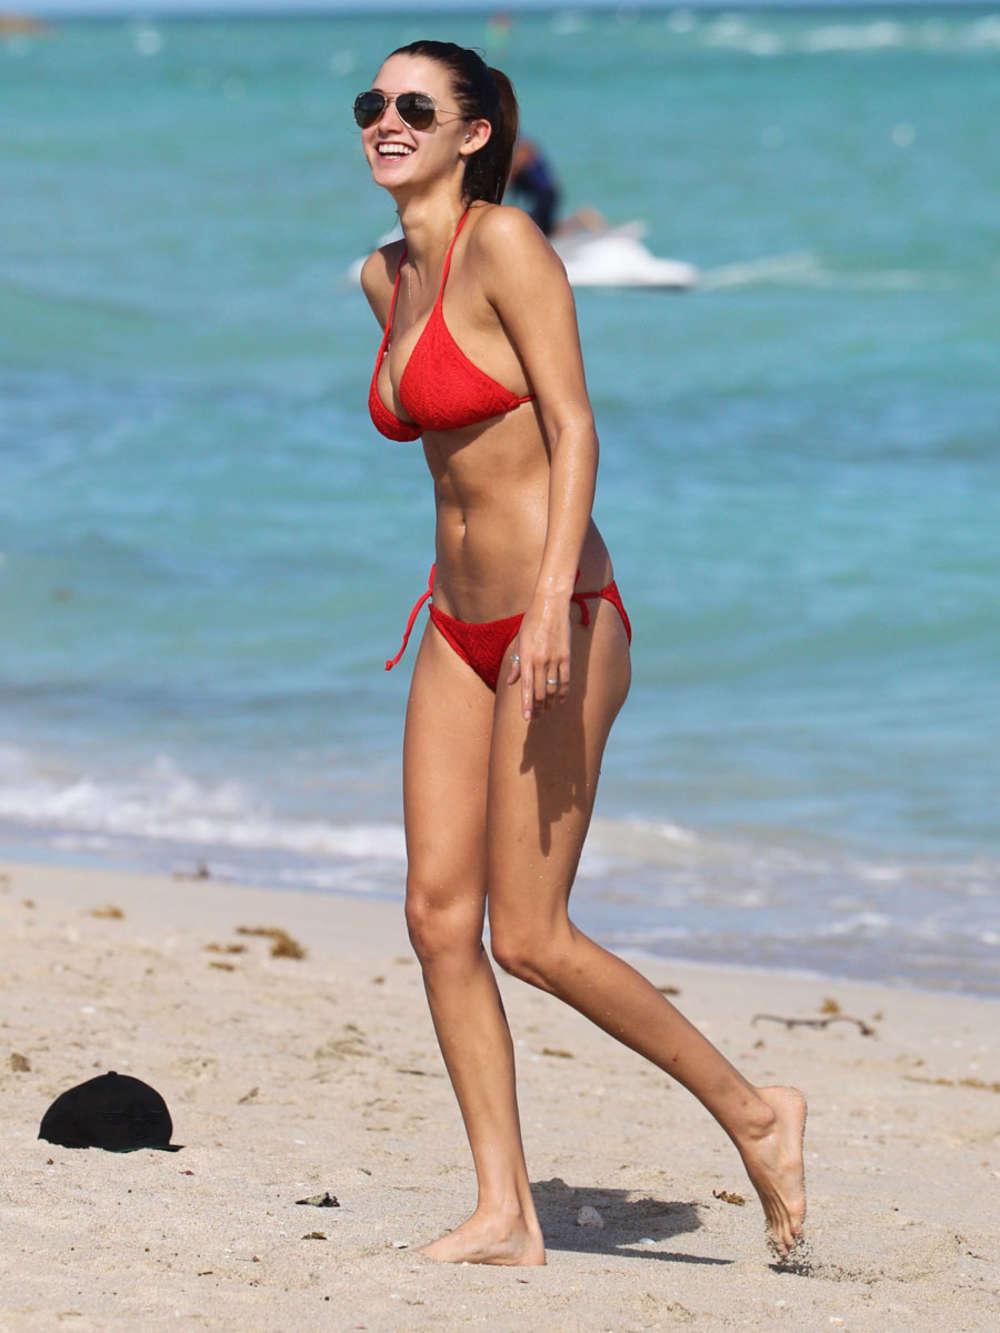 Alyssa Arce 2013 : Alyssa Arce Hot Bikini Photos: Miami -04